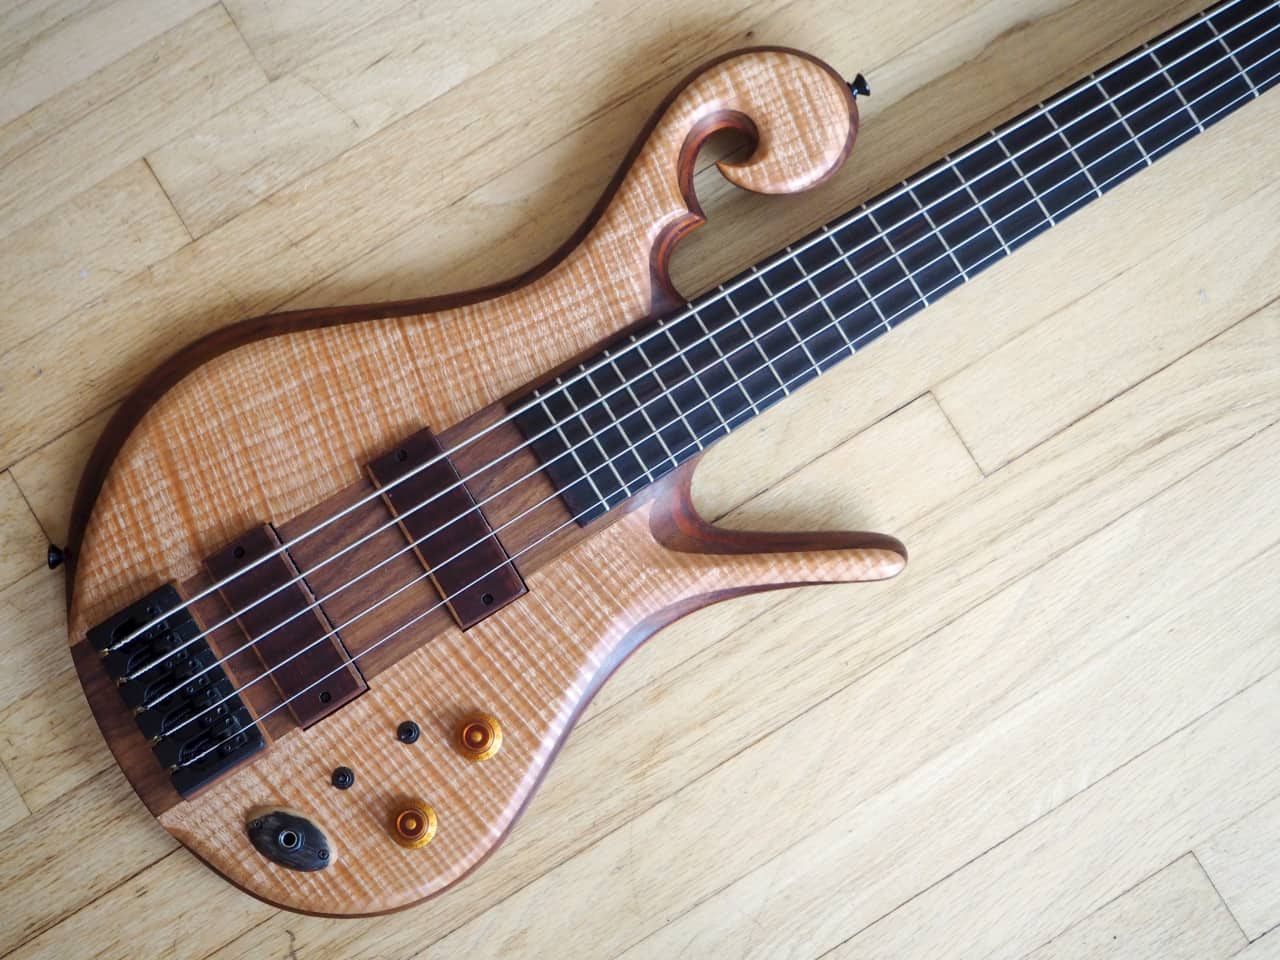 2015 carl thompson custom 5 string electric bass guitar reverb. Black Bedroom Furniture Sets. Home Design Ideas